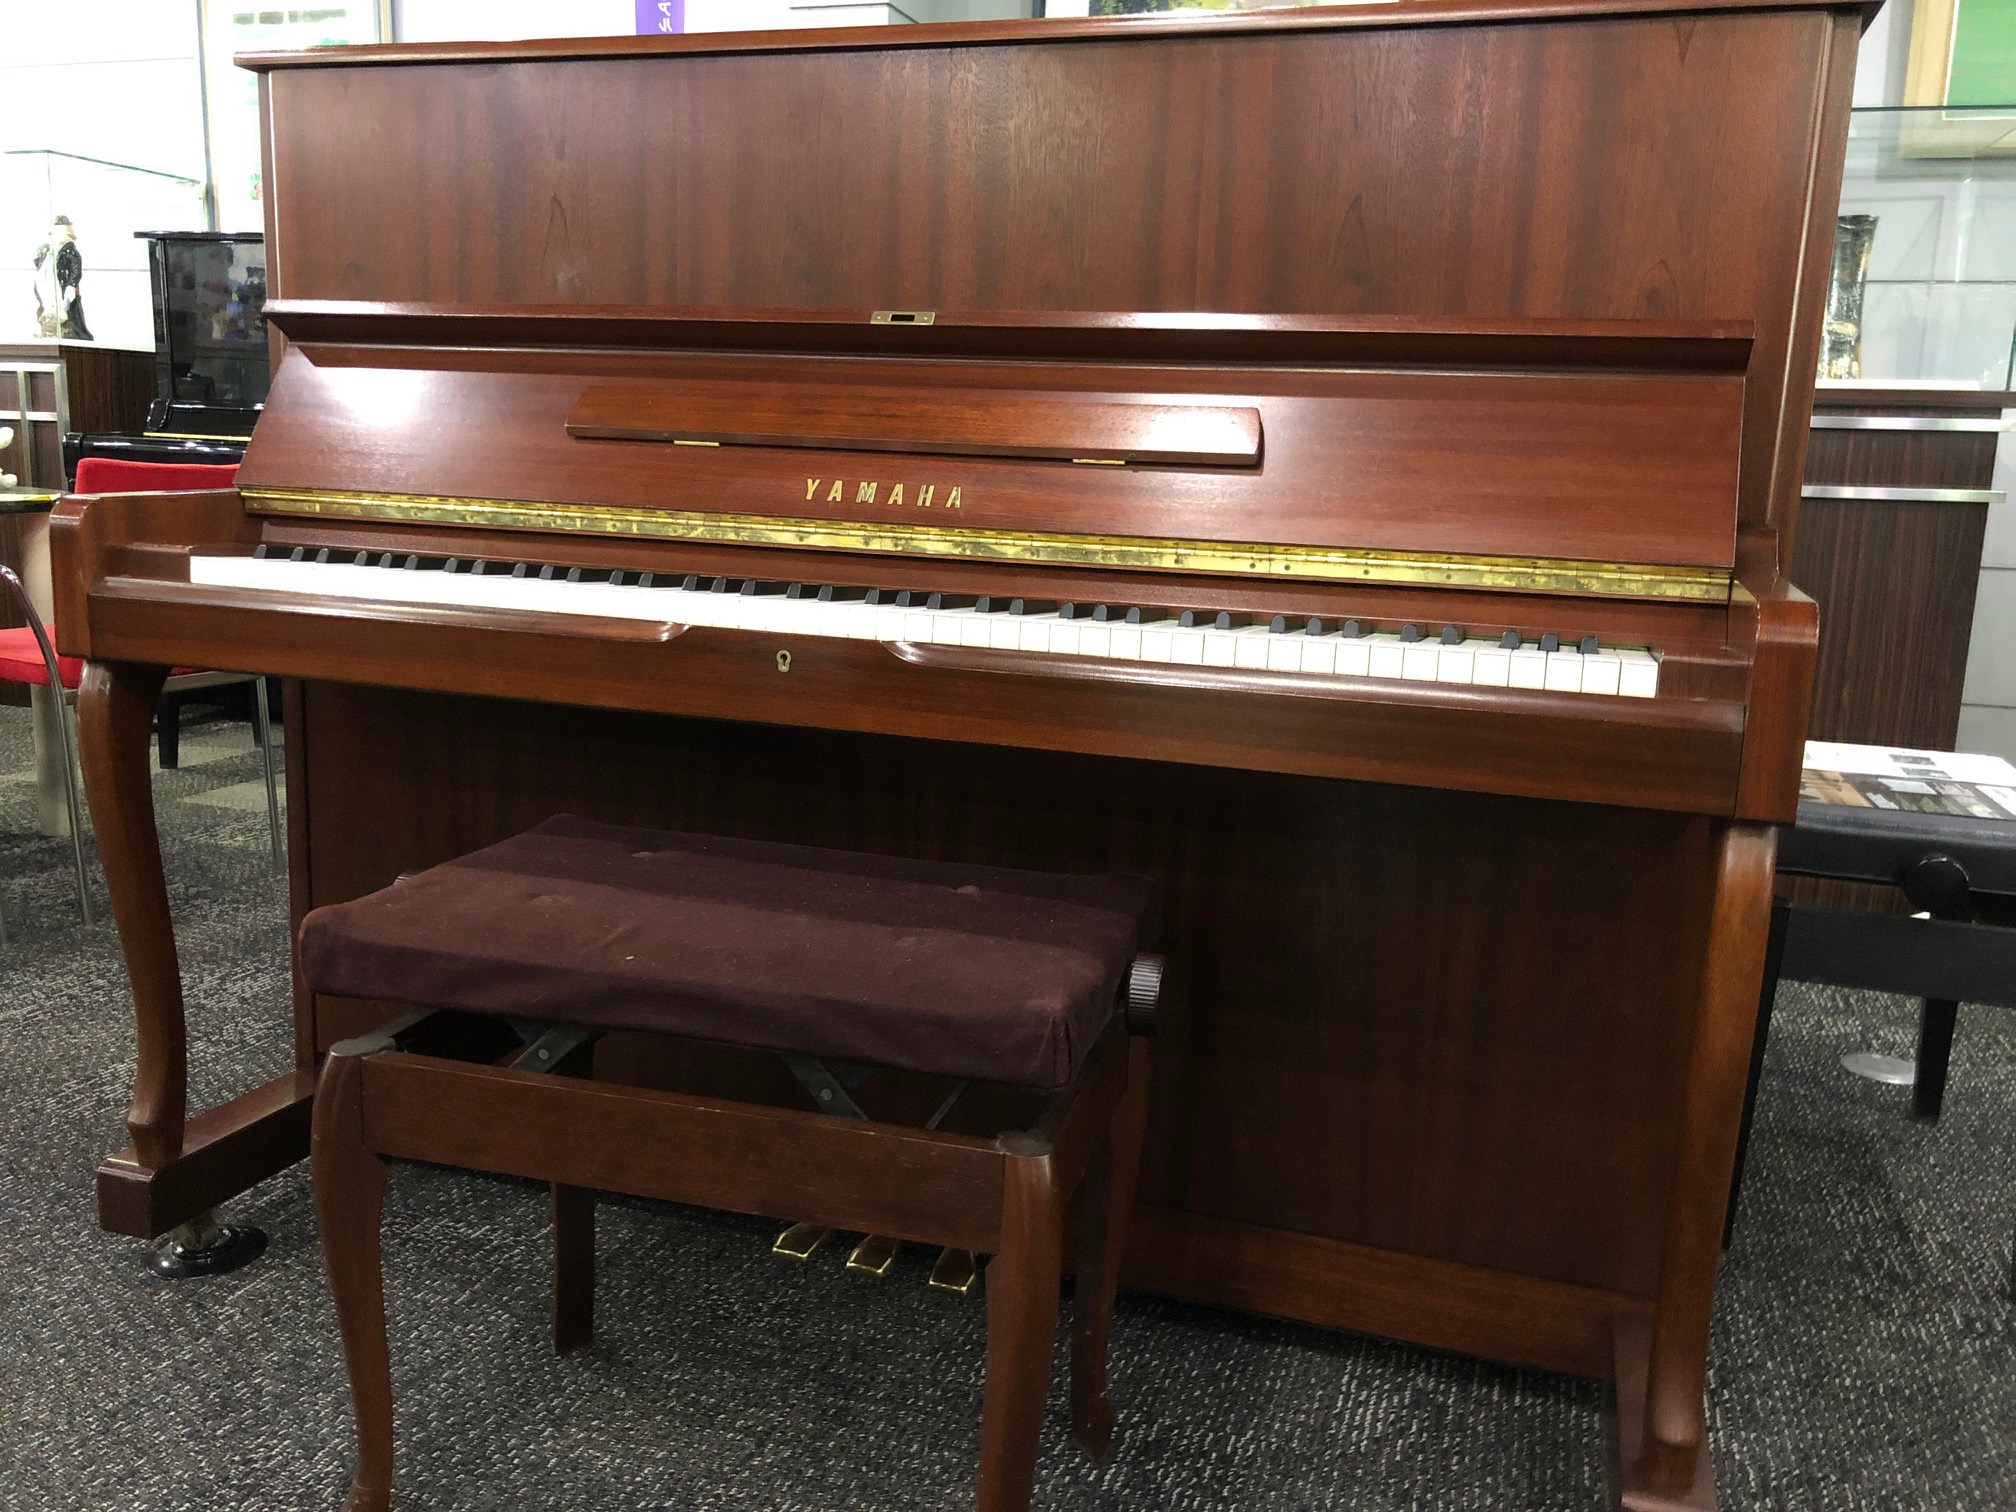 YAMAHA 中古ピアノ W110BS